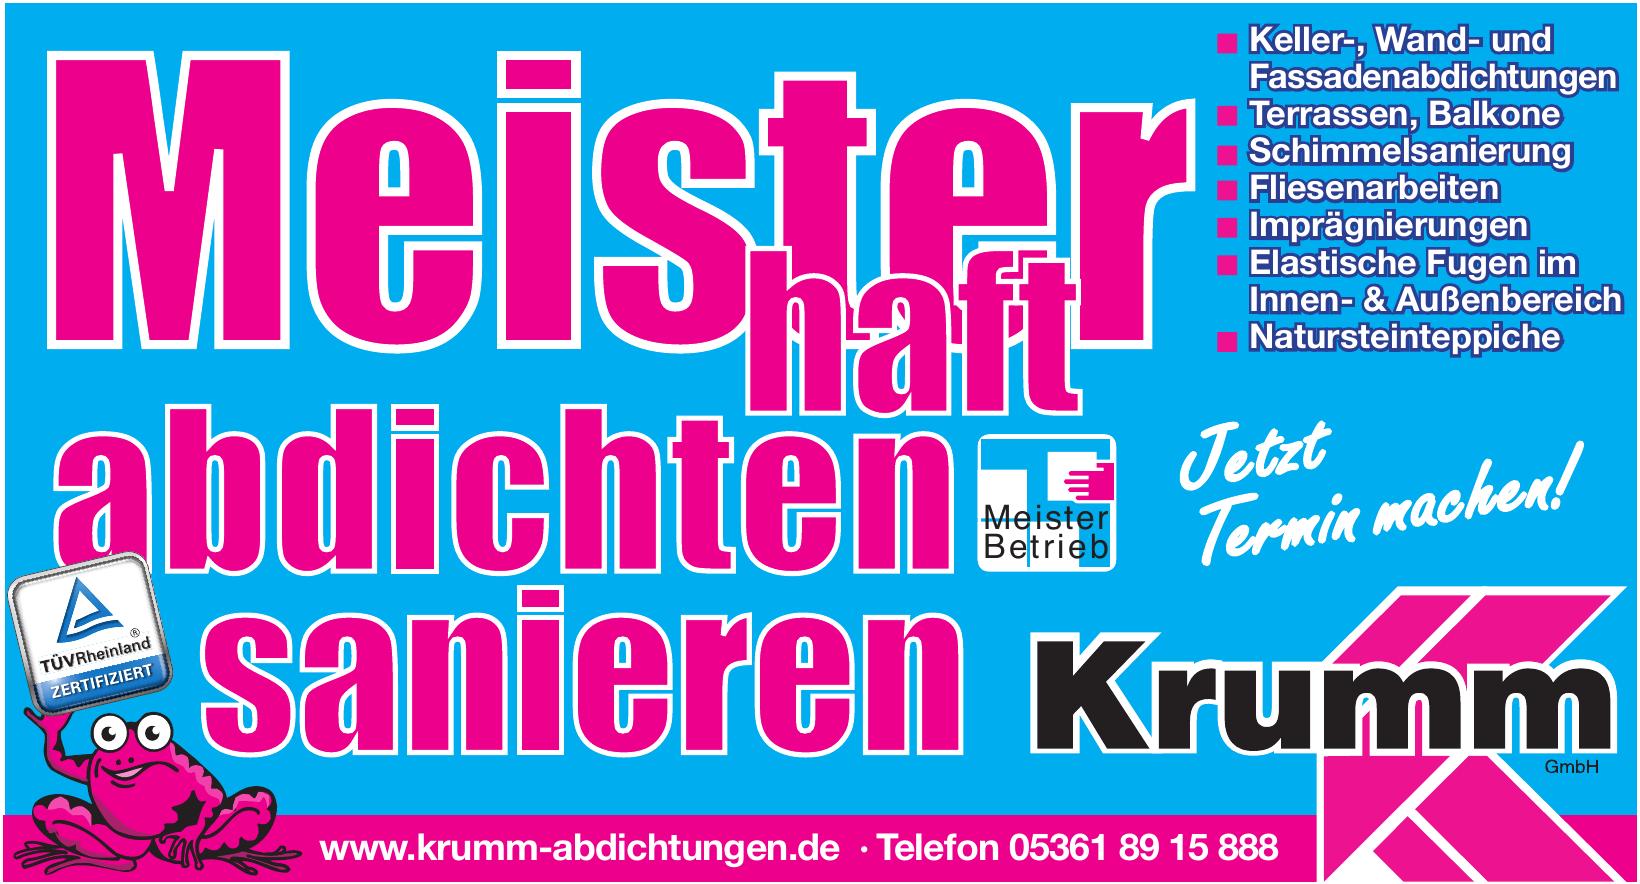 Krum GmbH